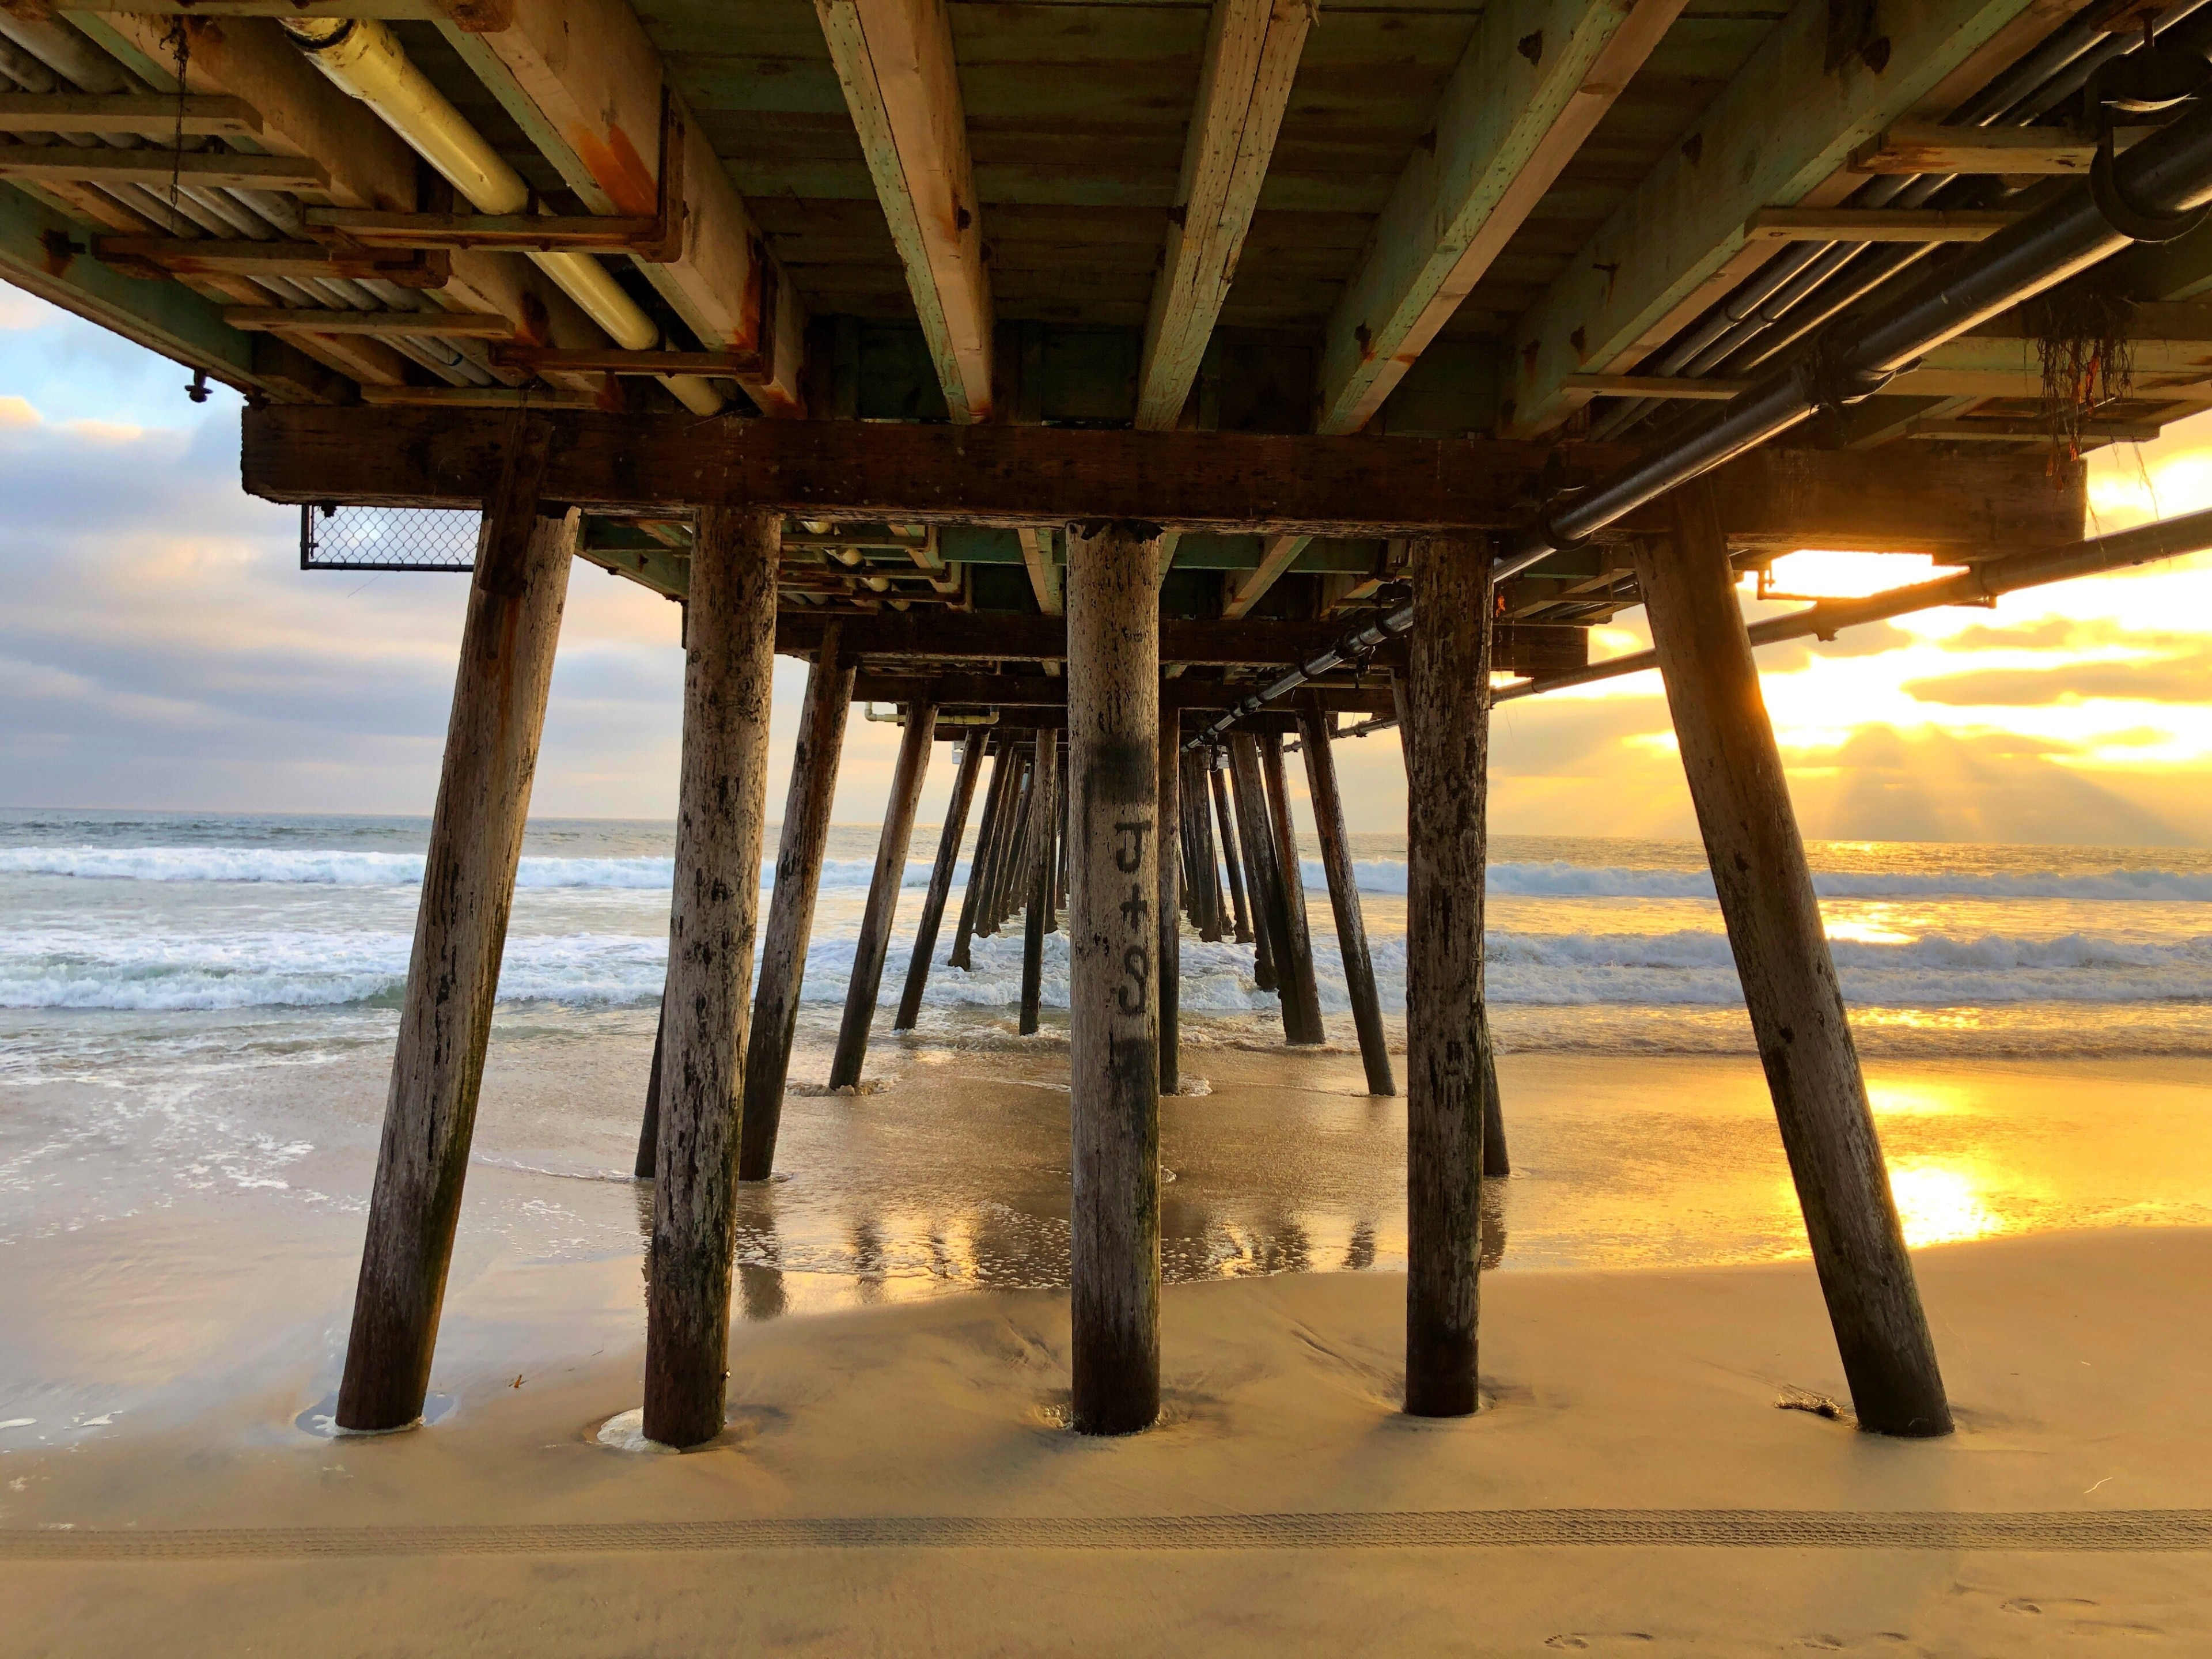 Imperial Beach, California, United States of America